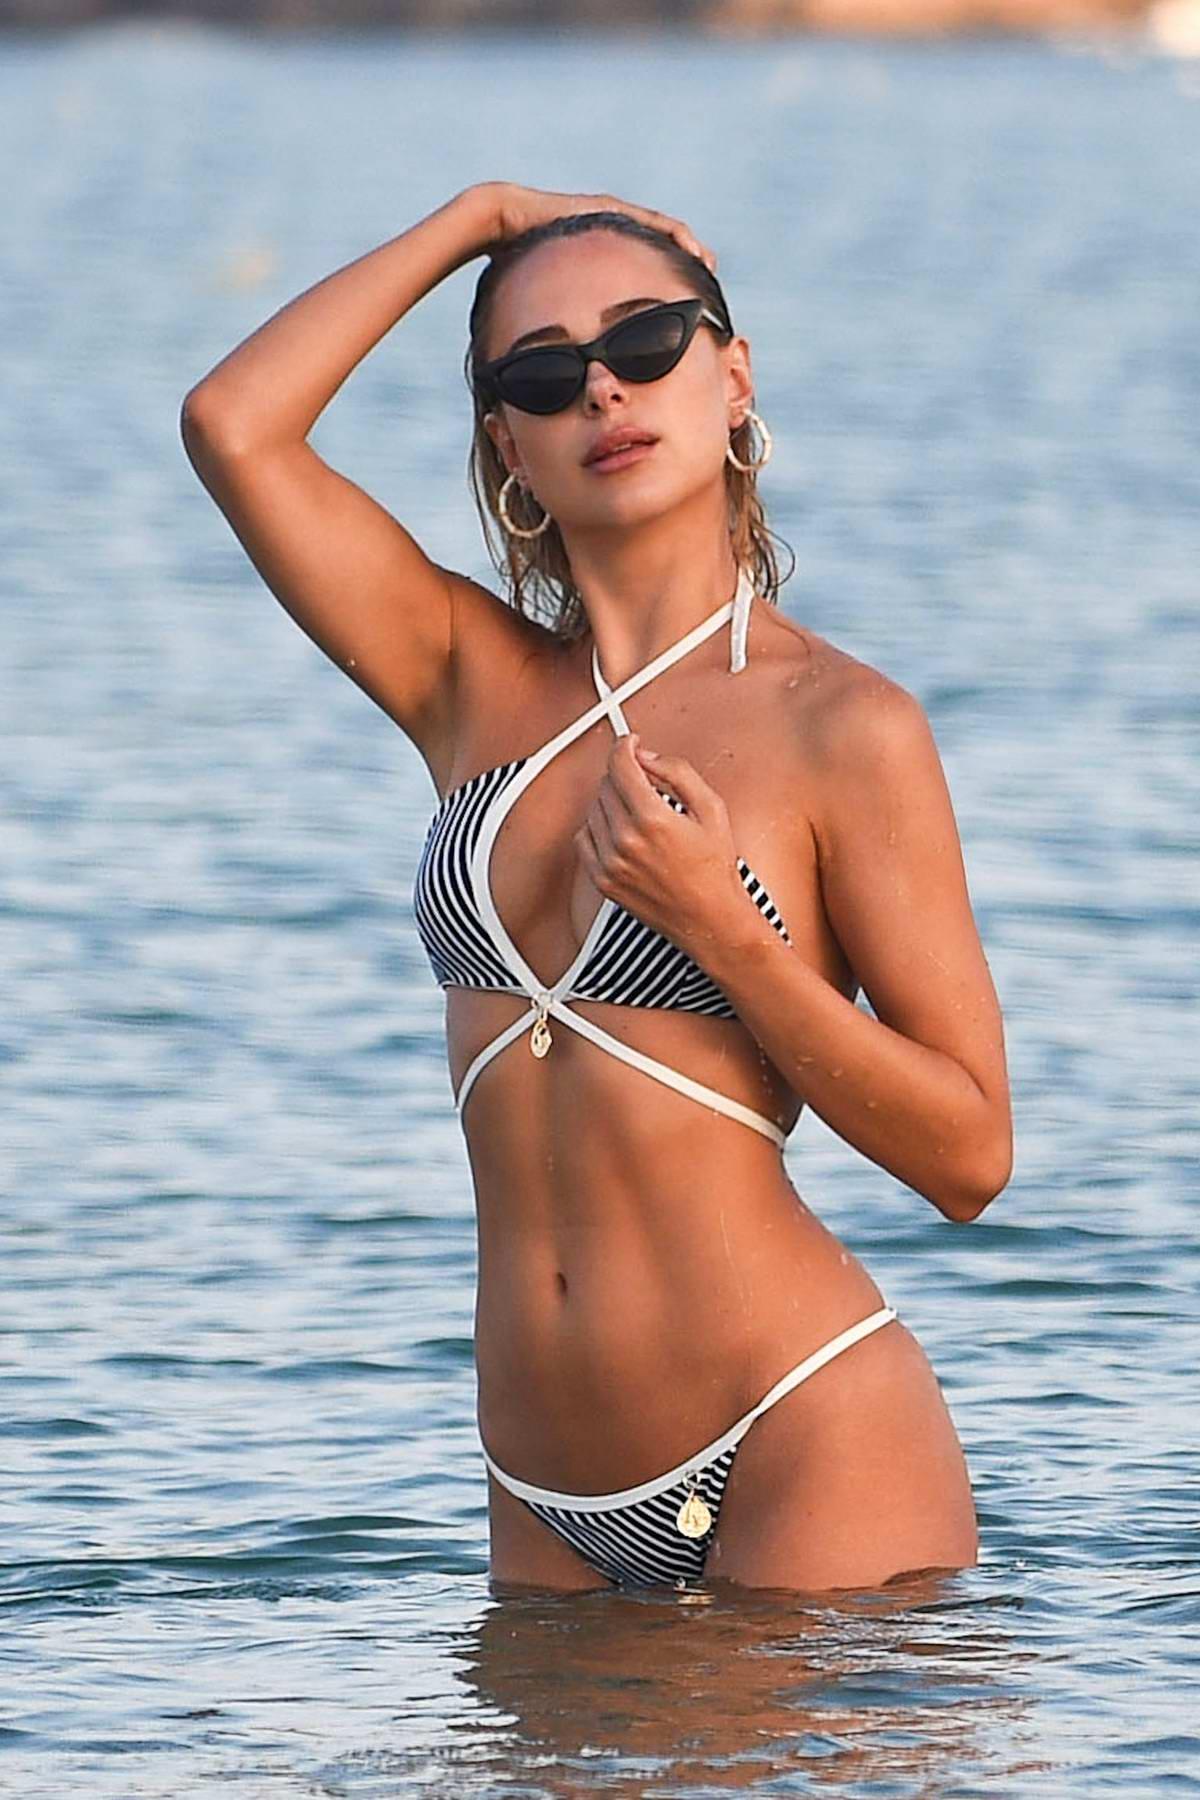 Kimberley Garner rocks a striped bikini from her own 'Kimberley London' Collection as she hits the beach in Miami, Florida